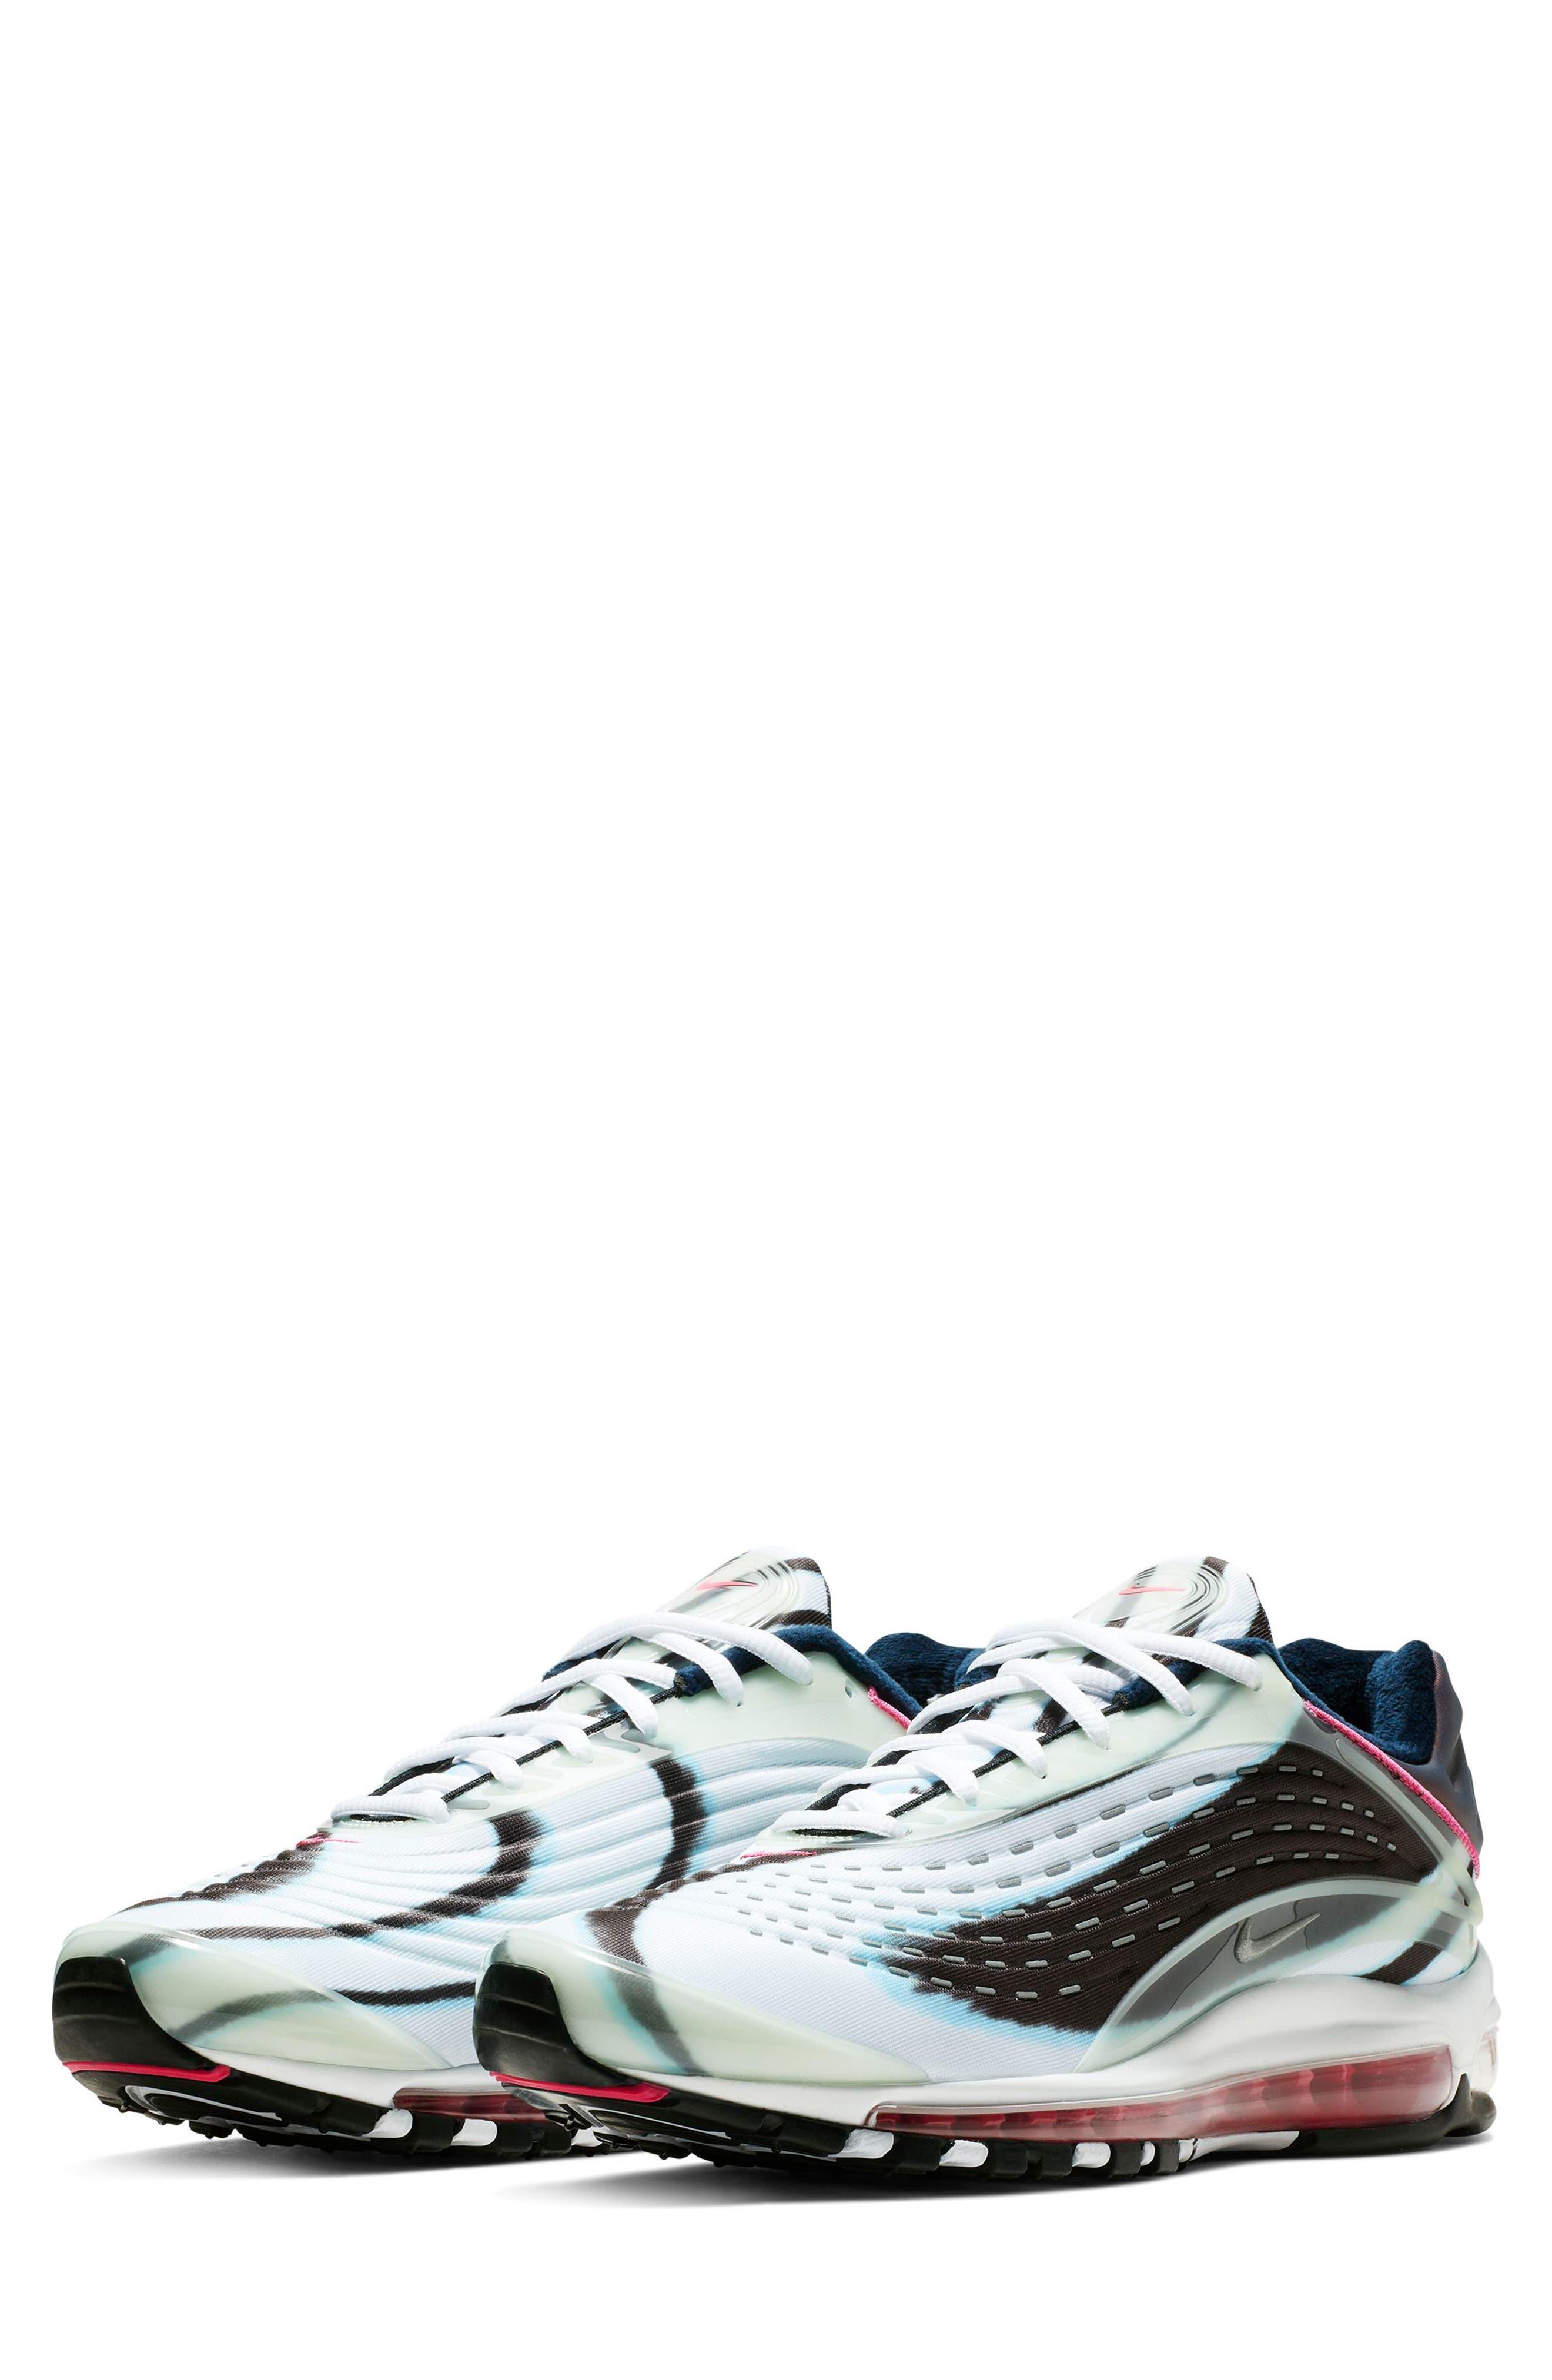 nike air max flair for sale california Style meets function in the Nike  Men s Shox NZ ... e4c442079